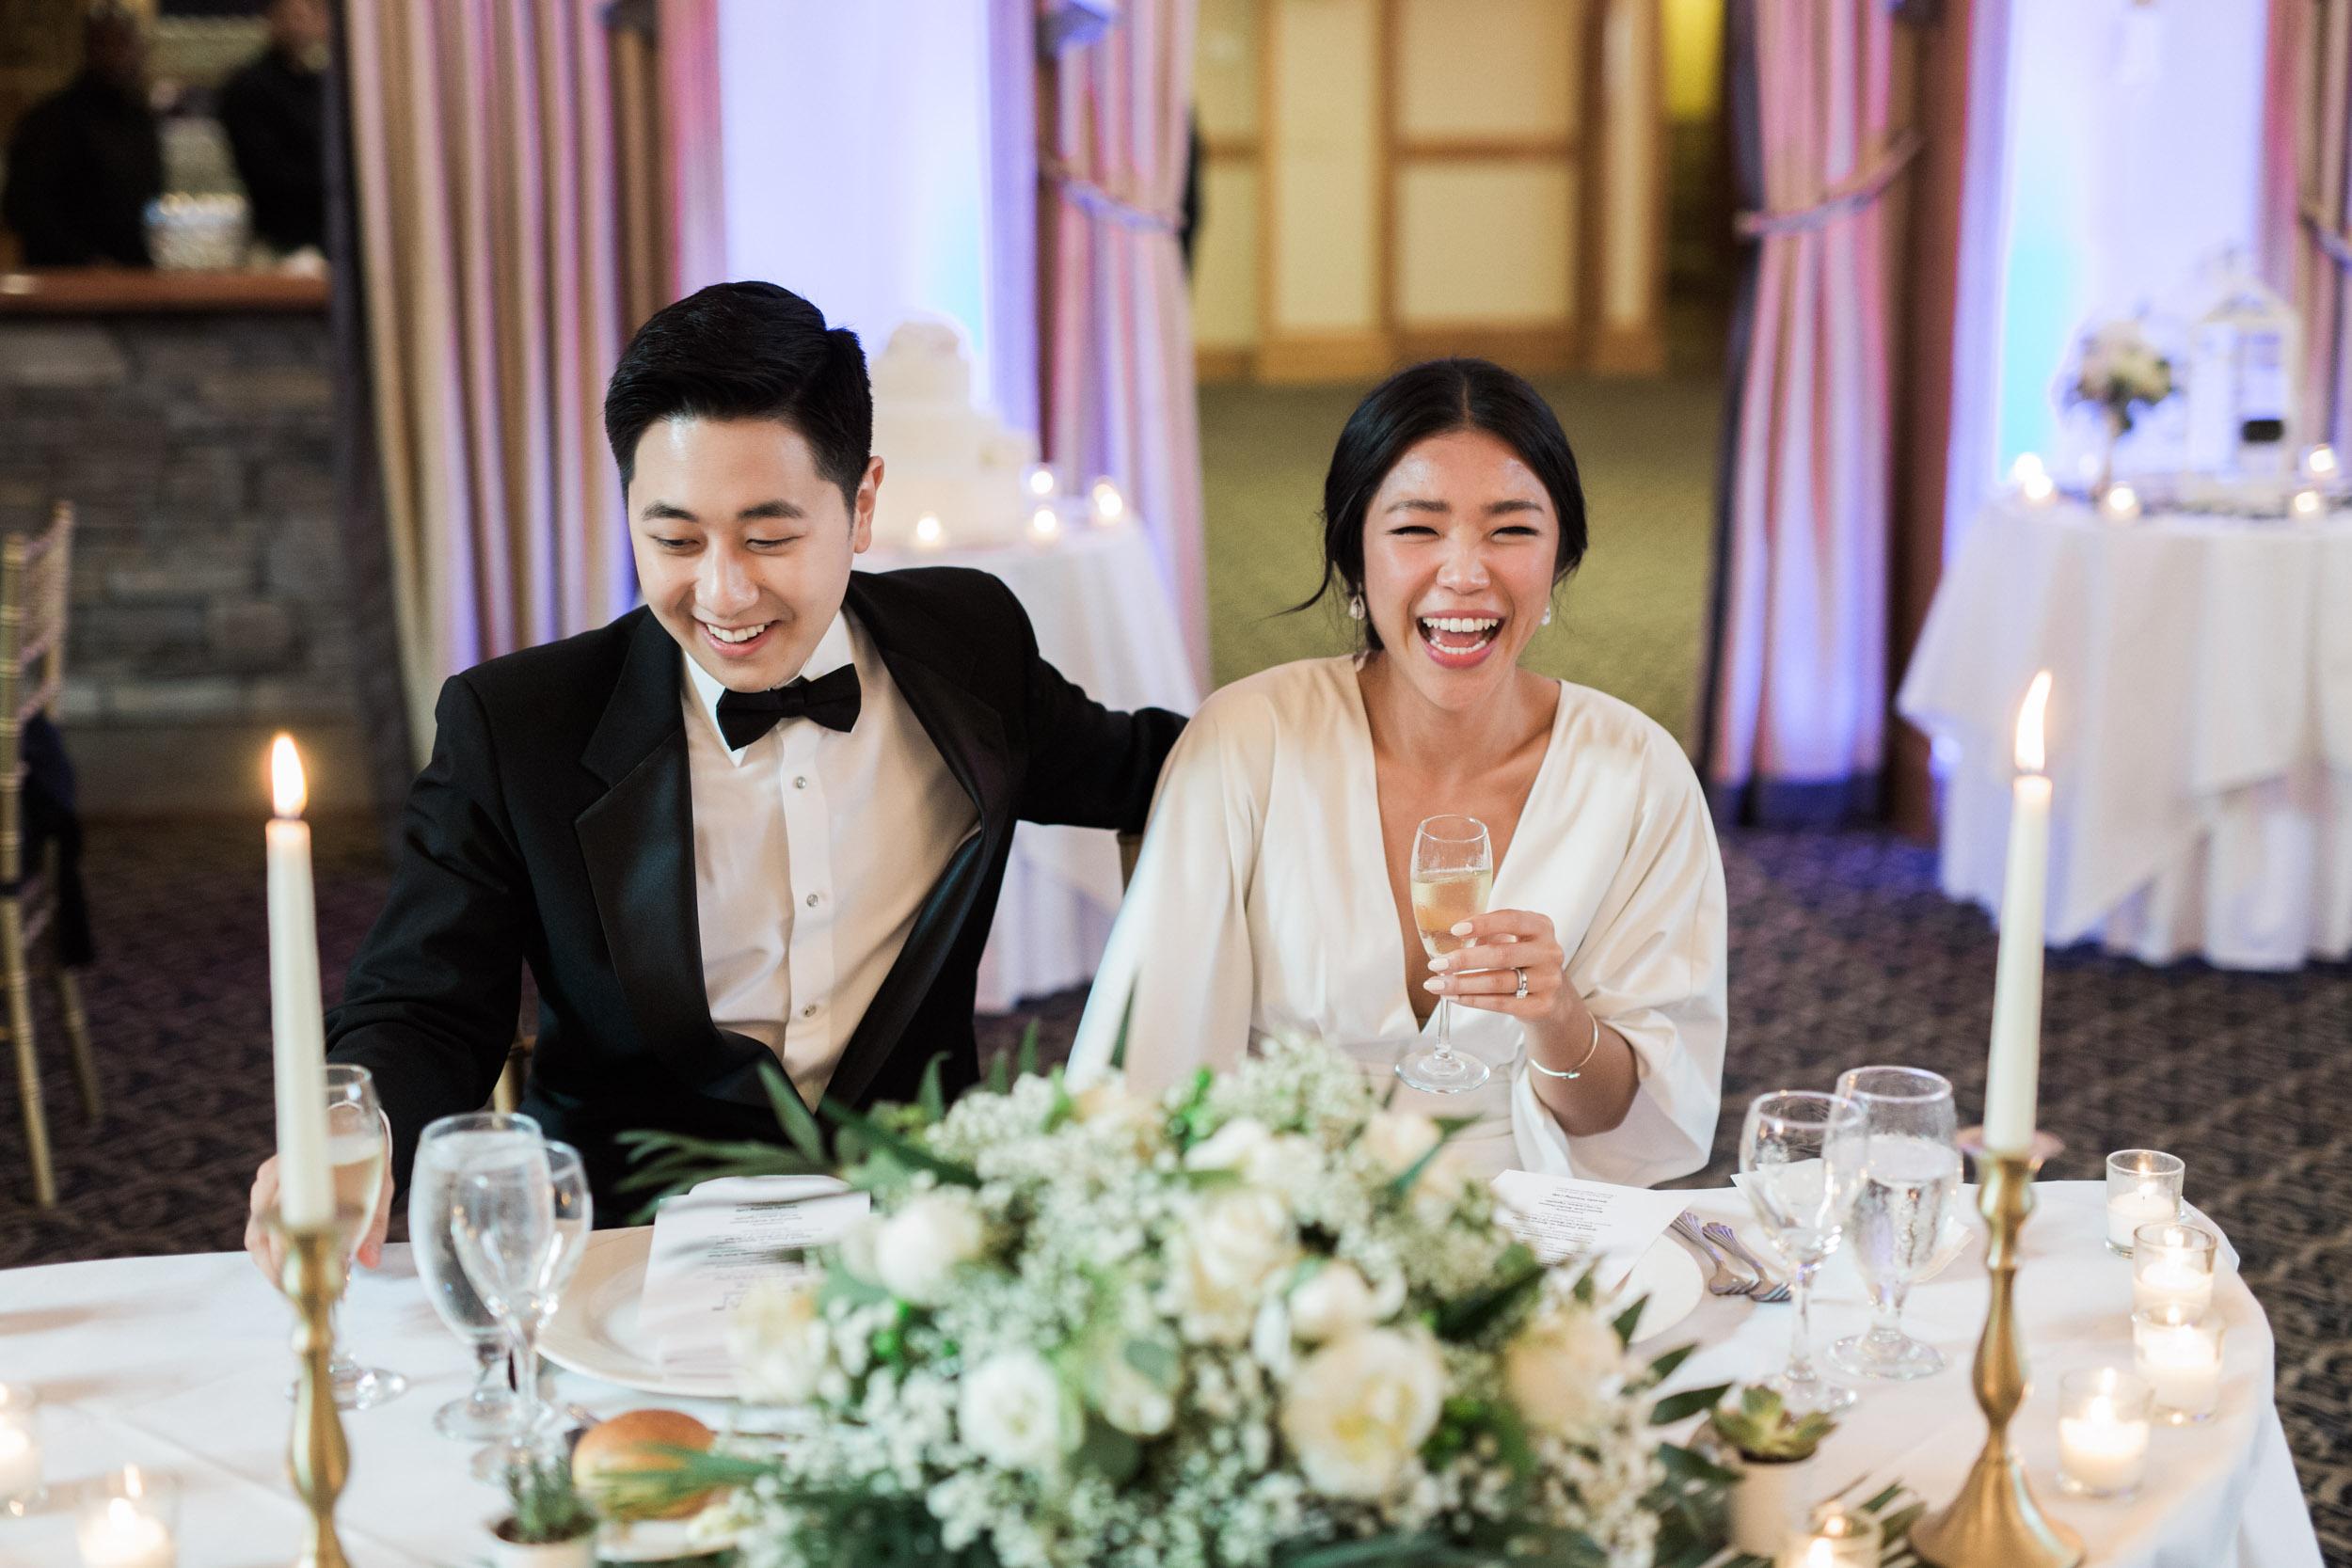 jean-arnold-wedding-0040.jpg